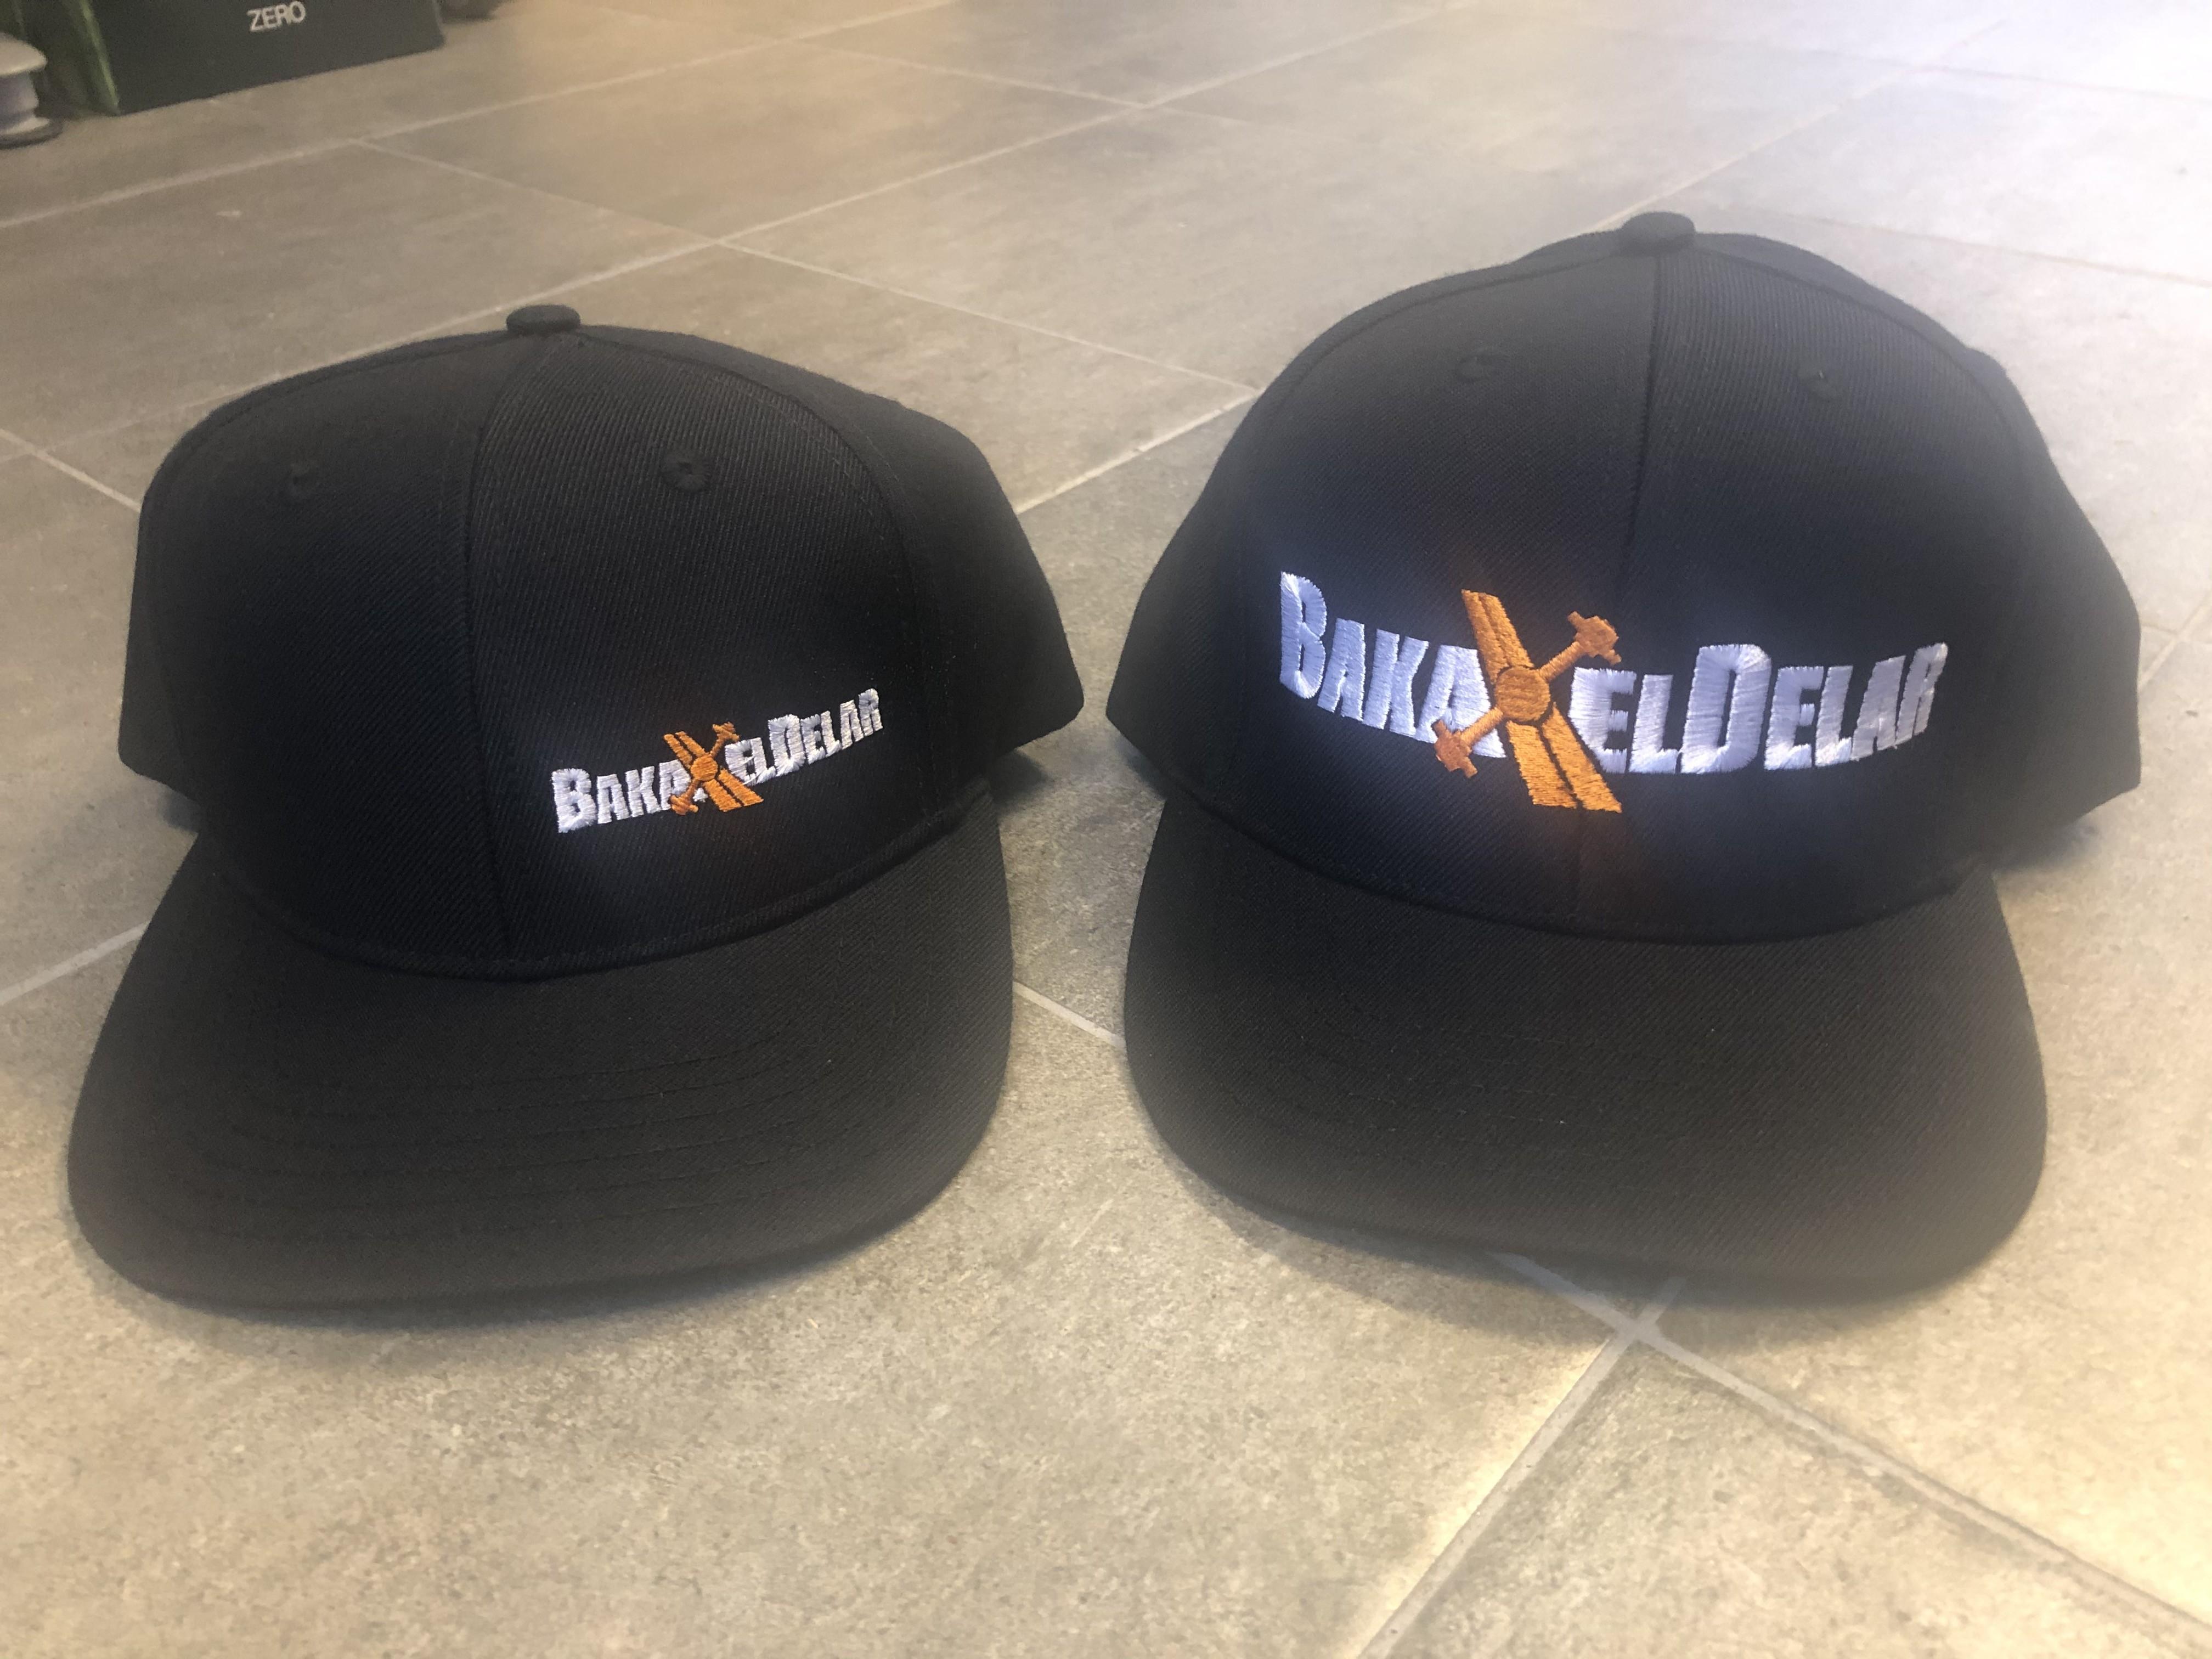 Bakaxeldelar Snapback New york, Exclusive line